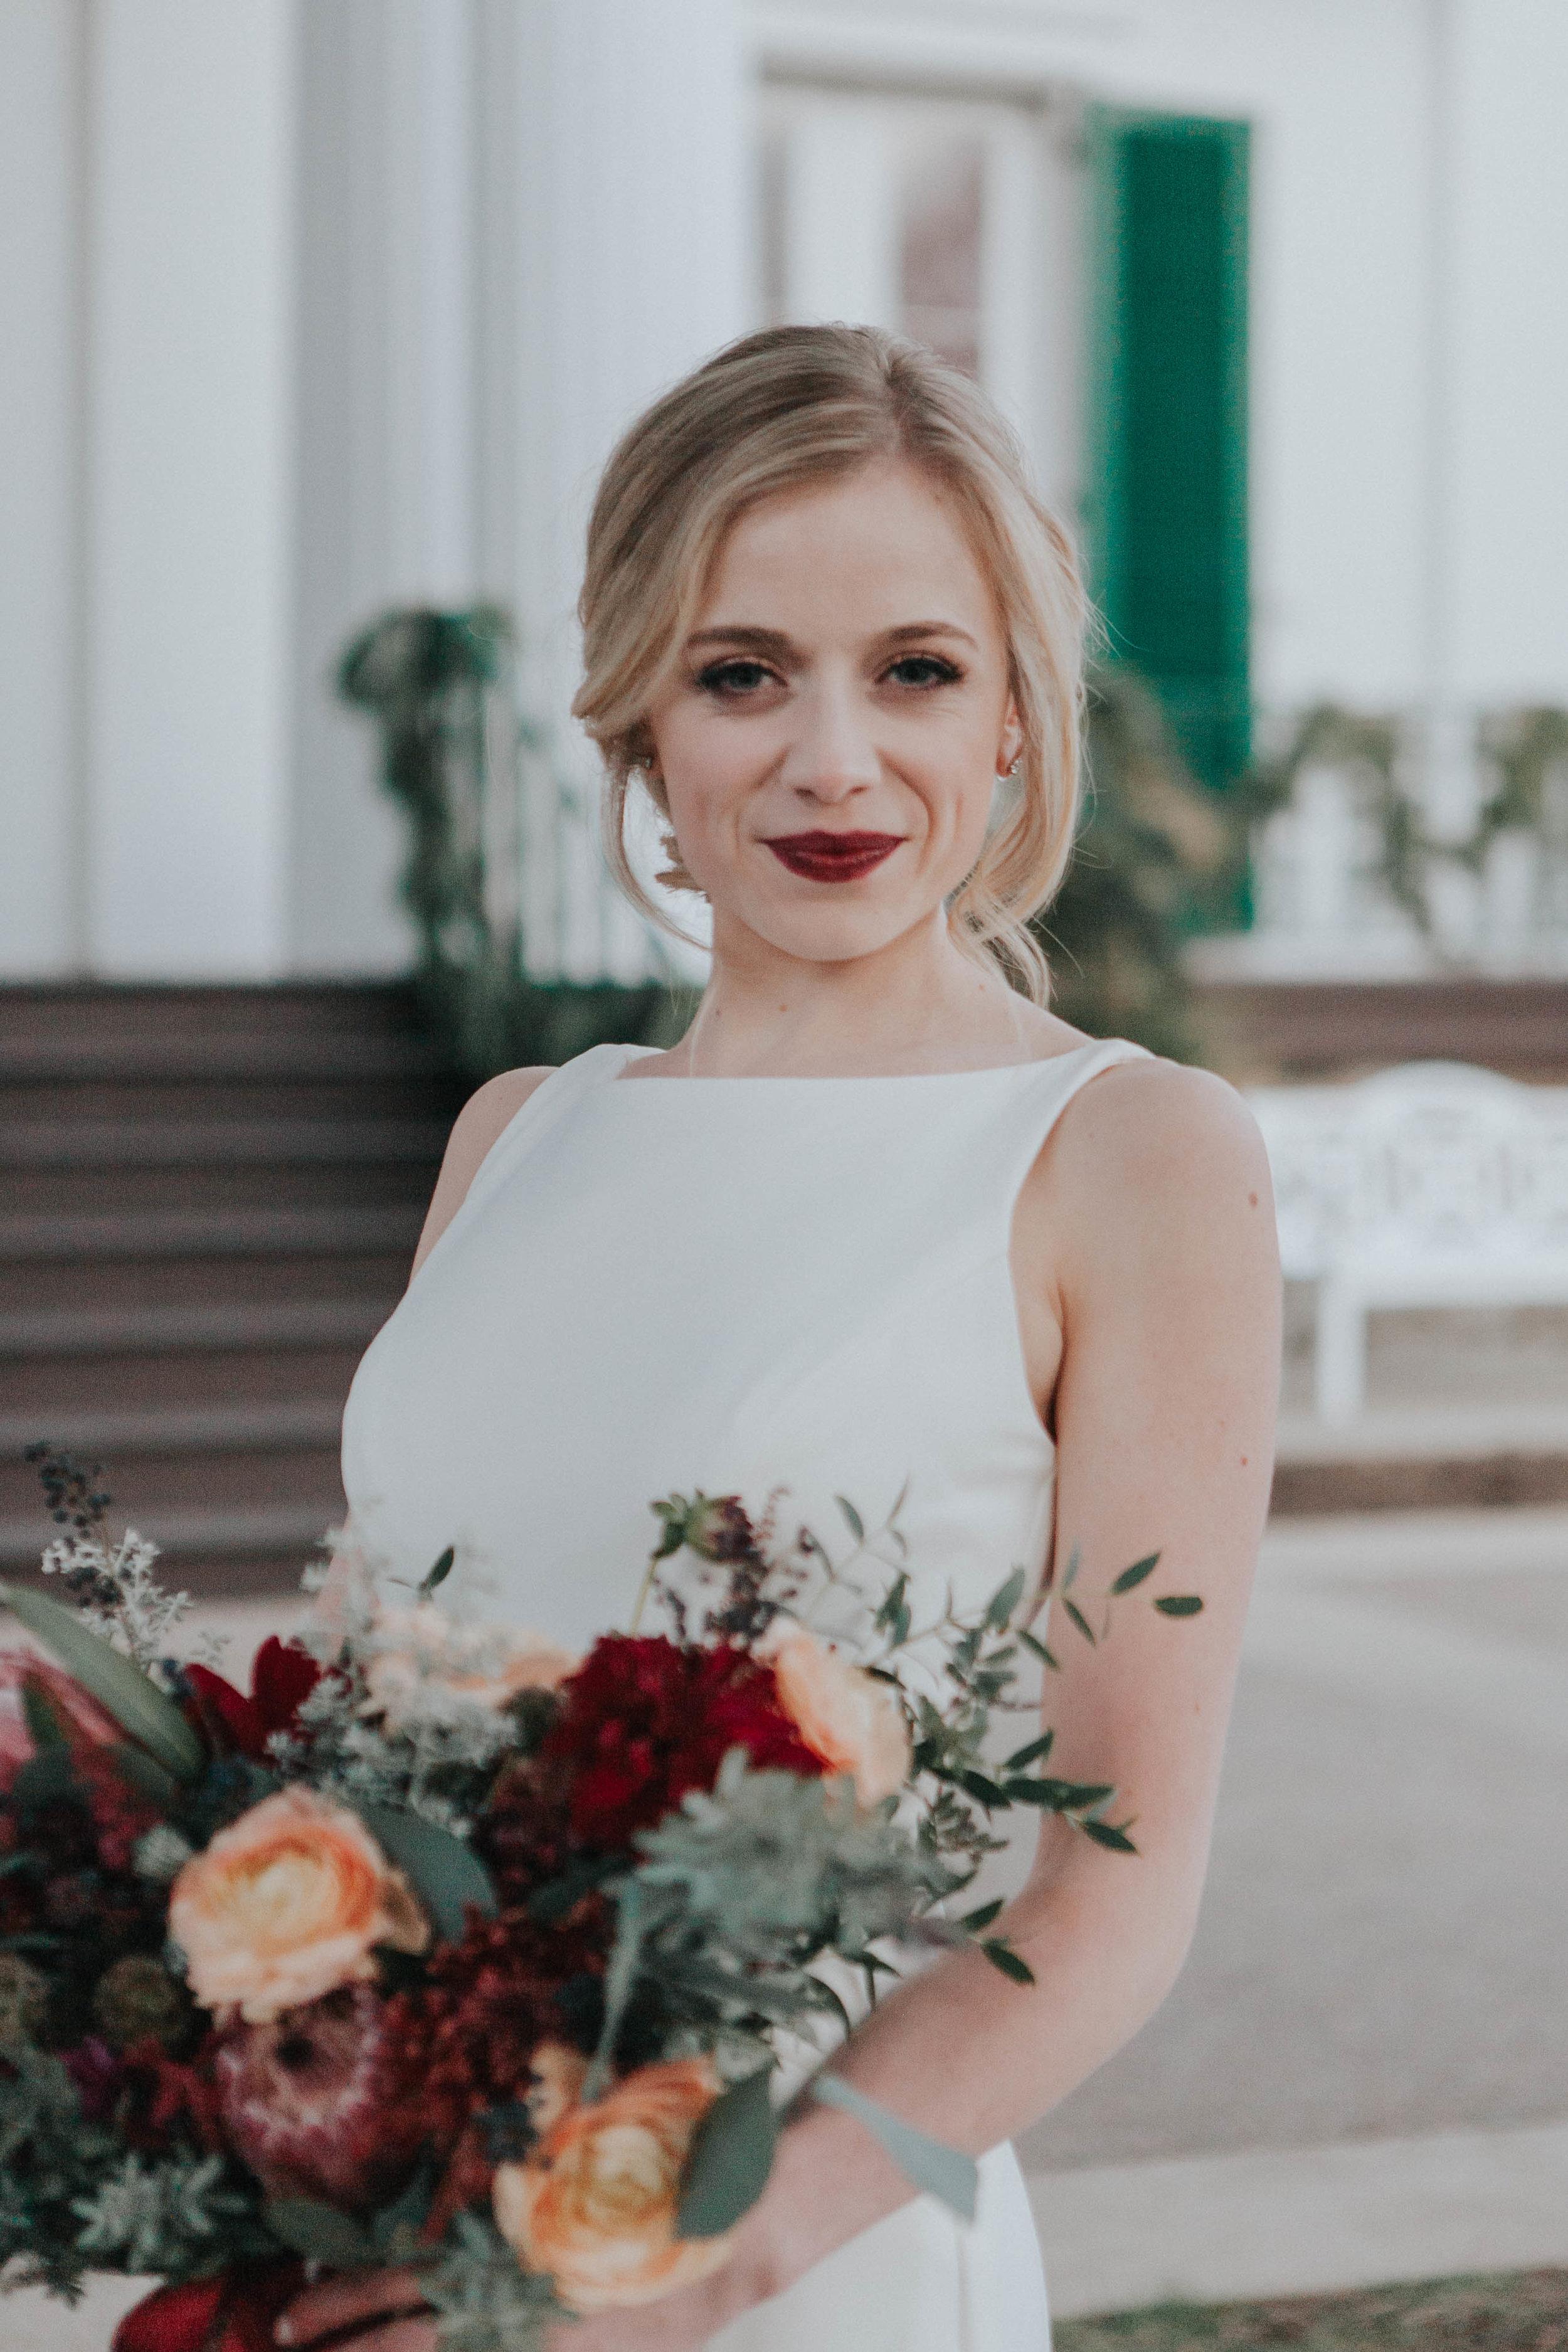 Charis_Lauren_Romantic_Wedding_Photographer_Nashville_01105.jpg